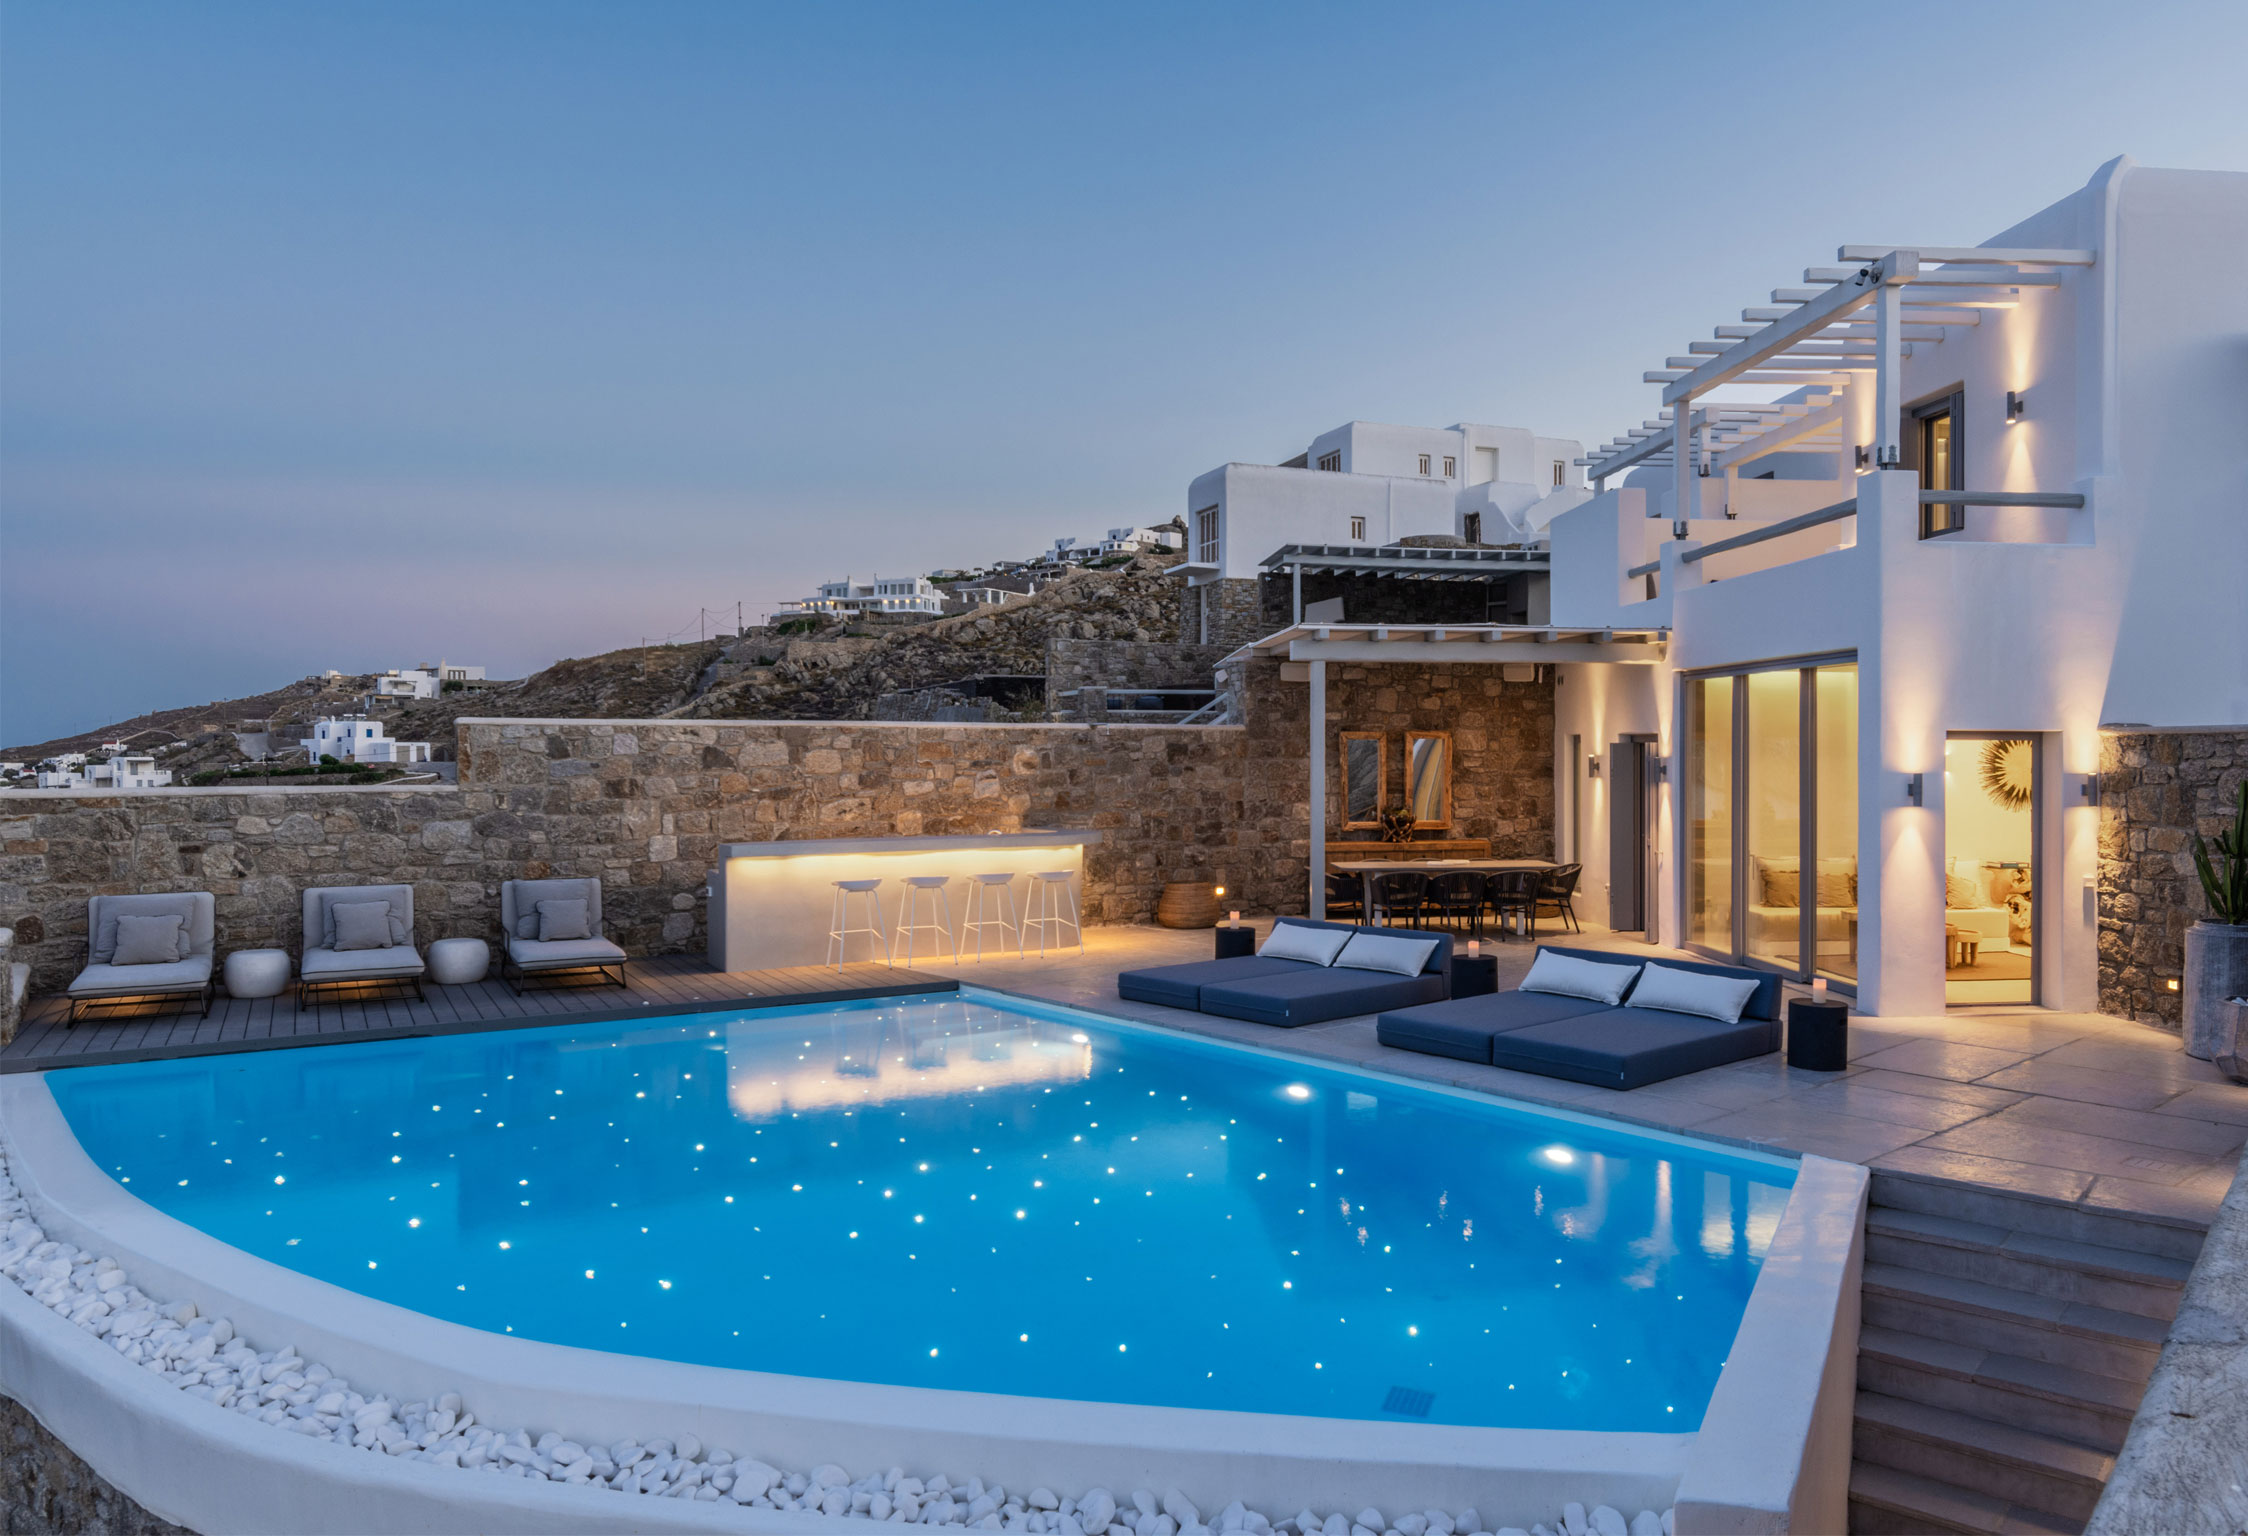 Mykonos Villa Adele jumbotron image